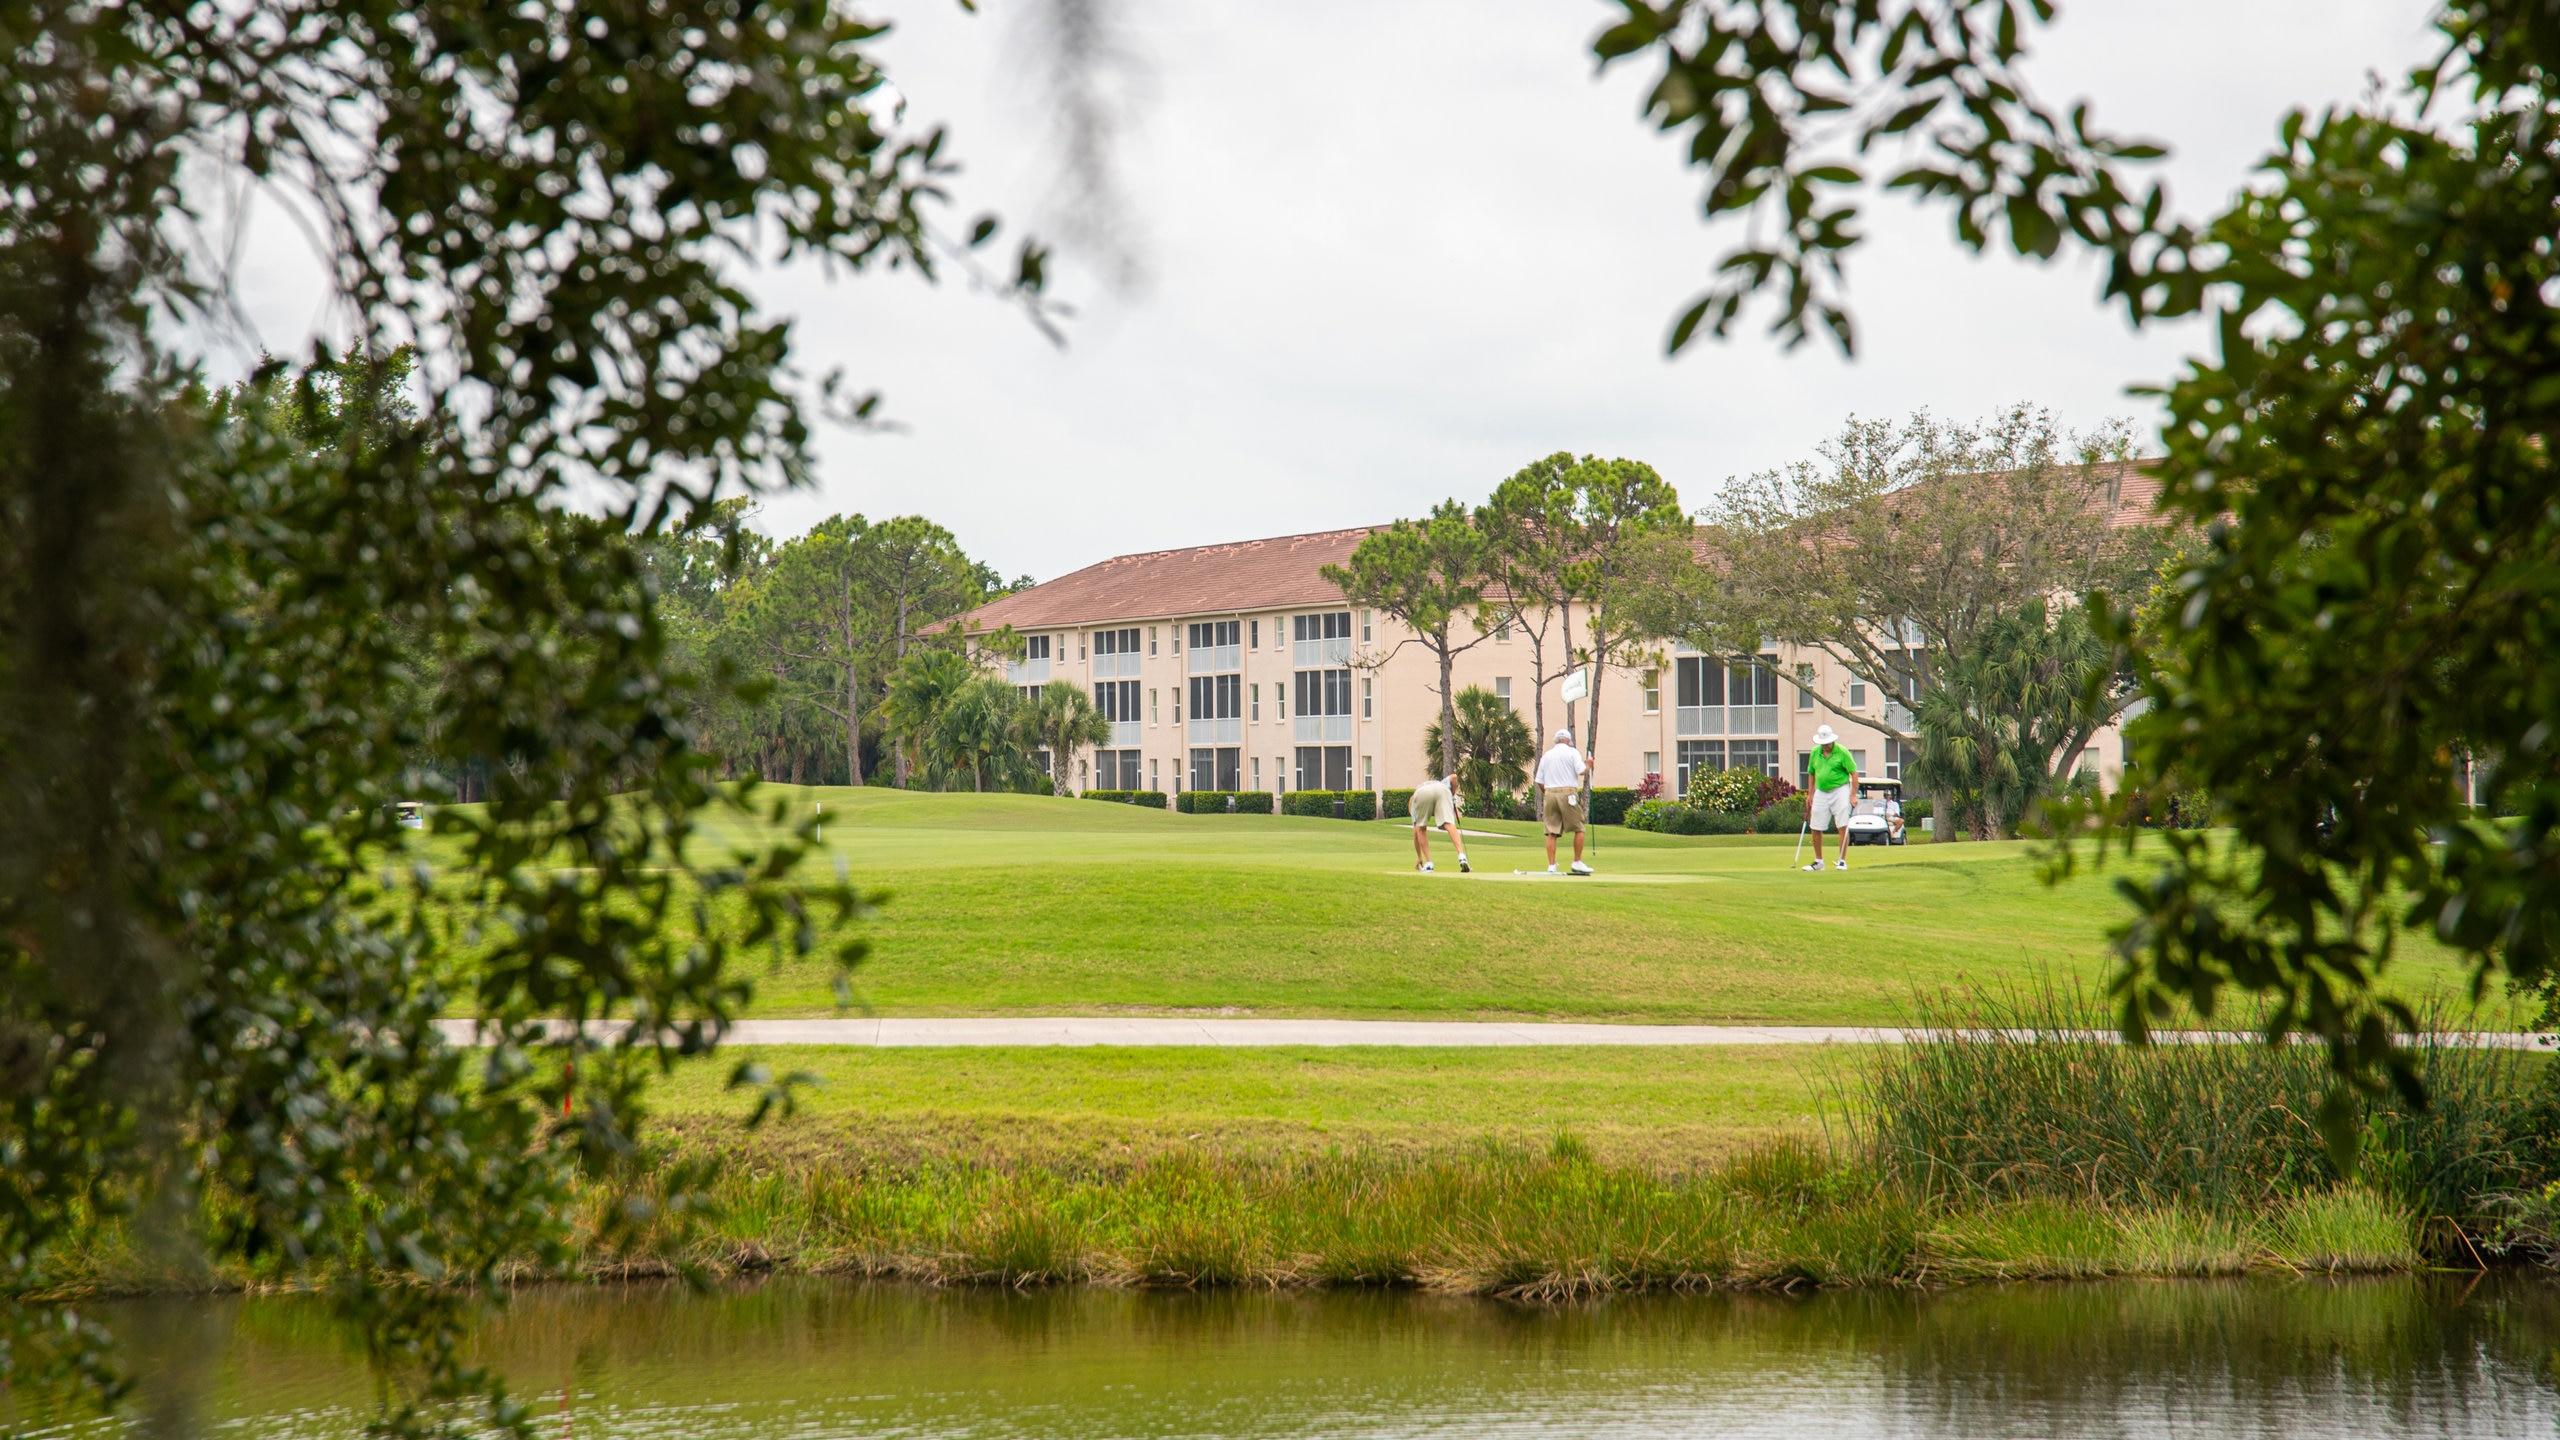 Palmer Ranch, Sarasota, Florida, United States of America